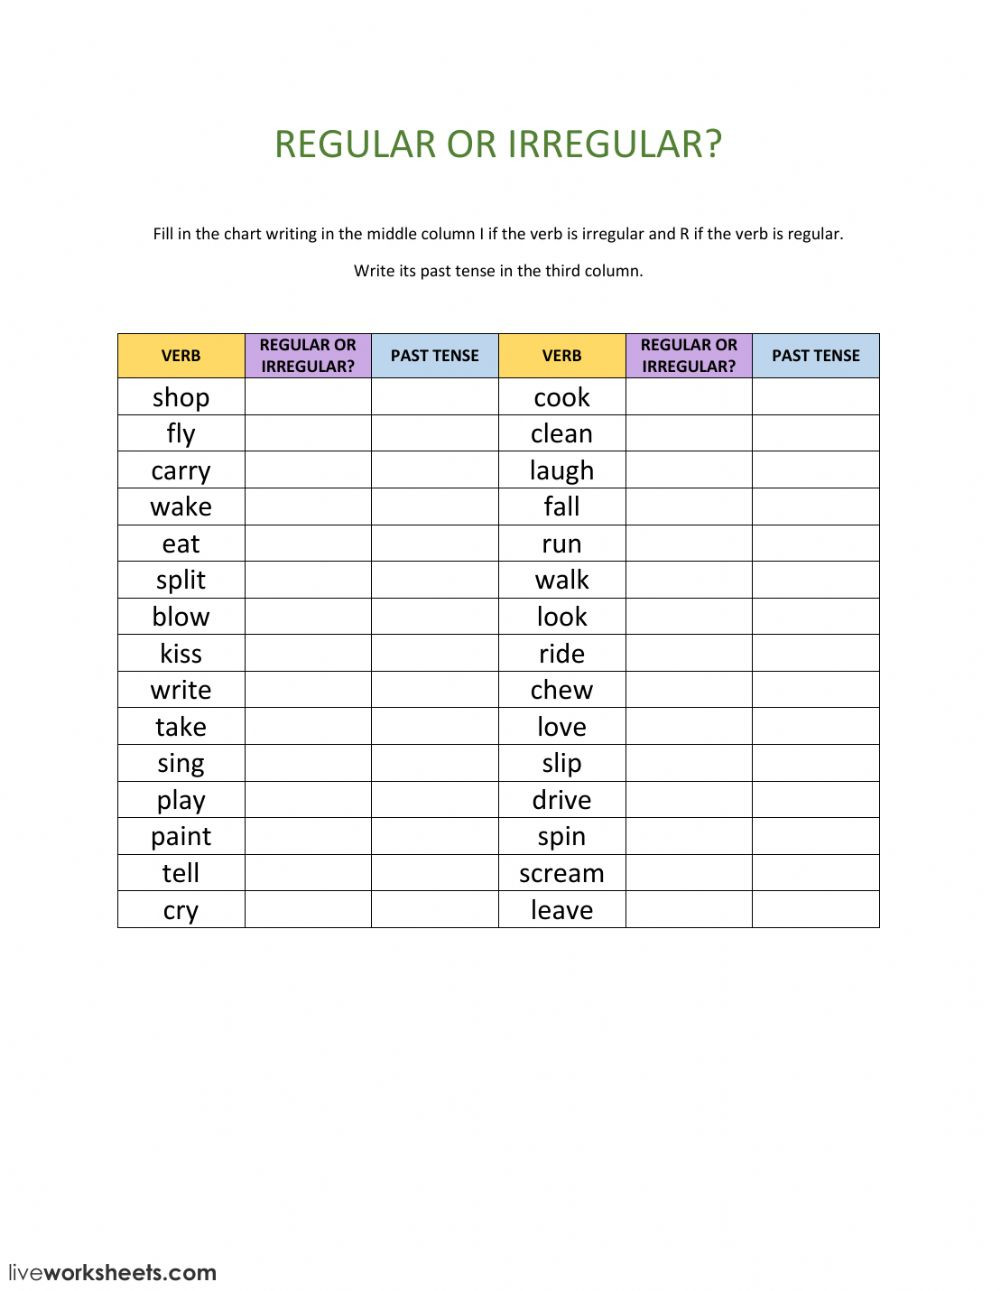 Irregular Verbs Worksheet Pdf Regular or Irregular Verbs Interactive Worksheet